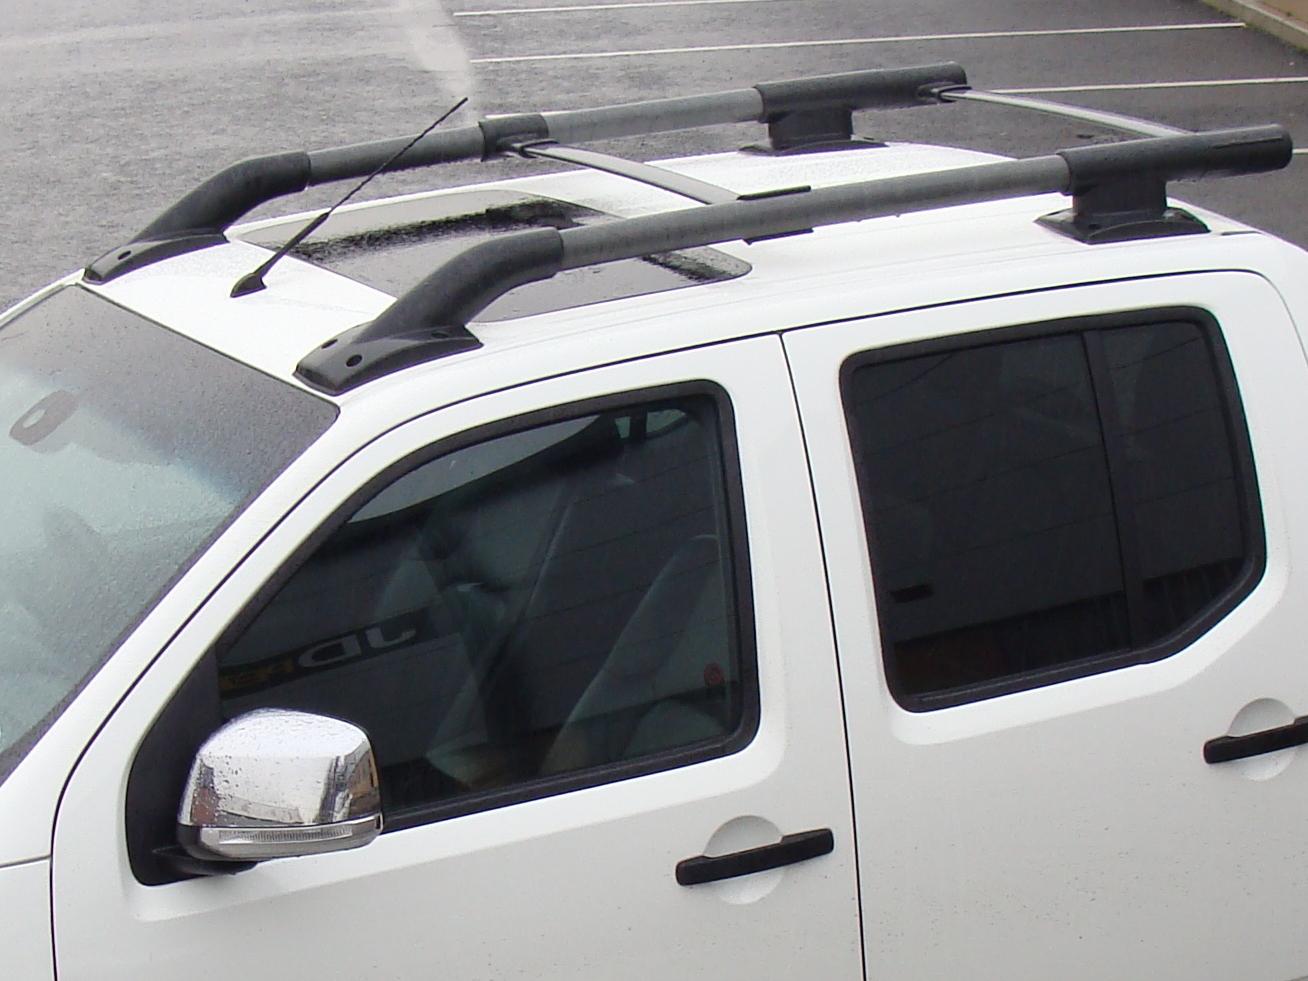 pro car by fishing runner snowboard carrier front mkii rod holder au for en ski rack board snow